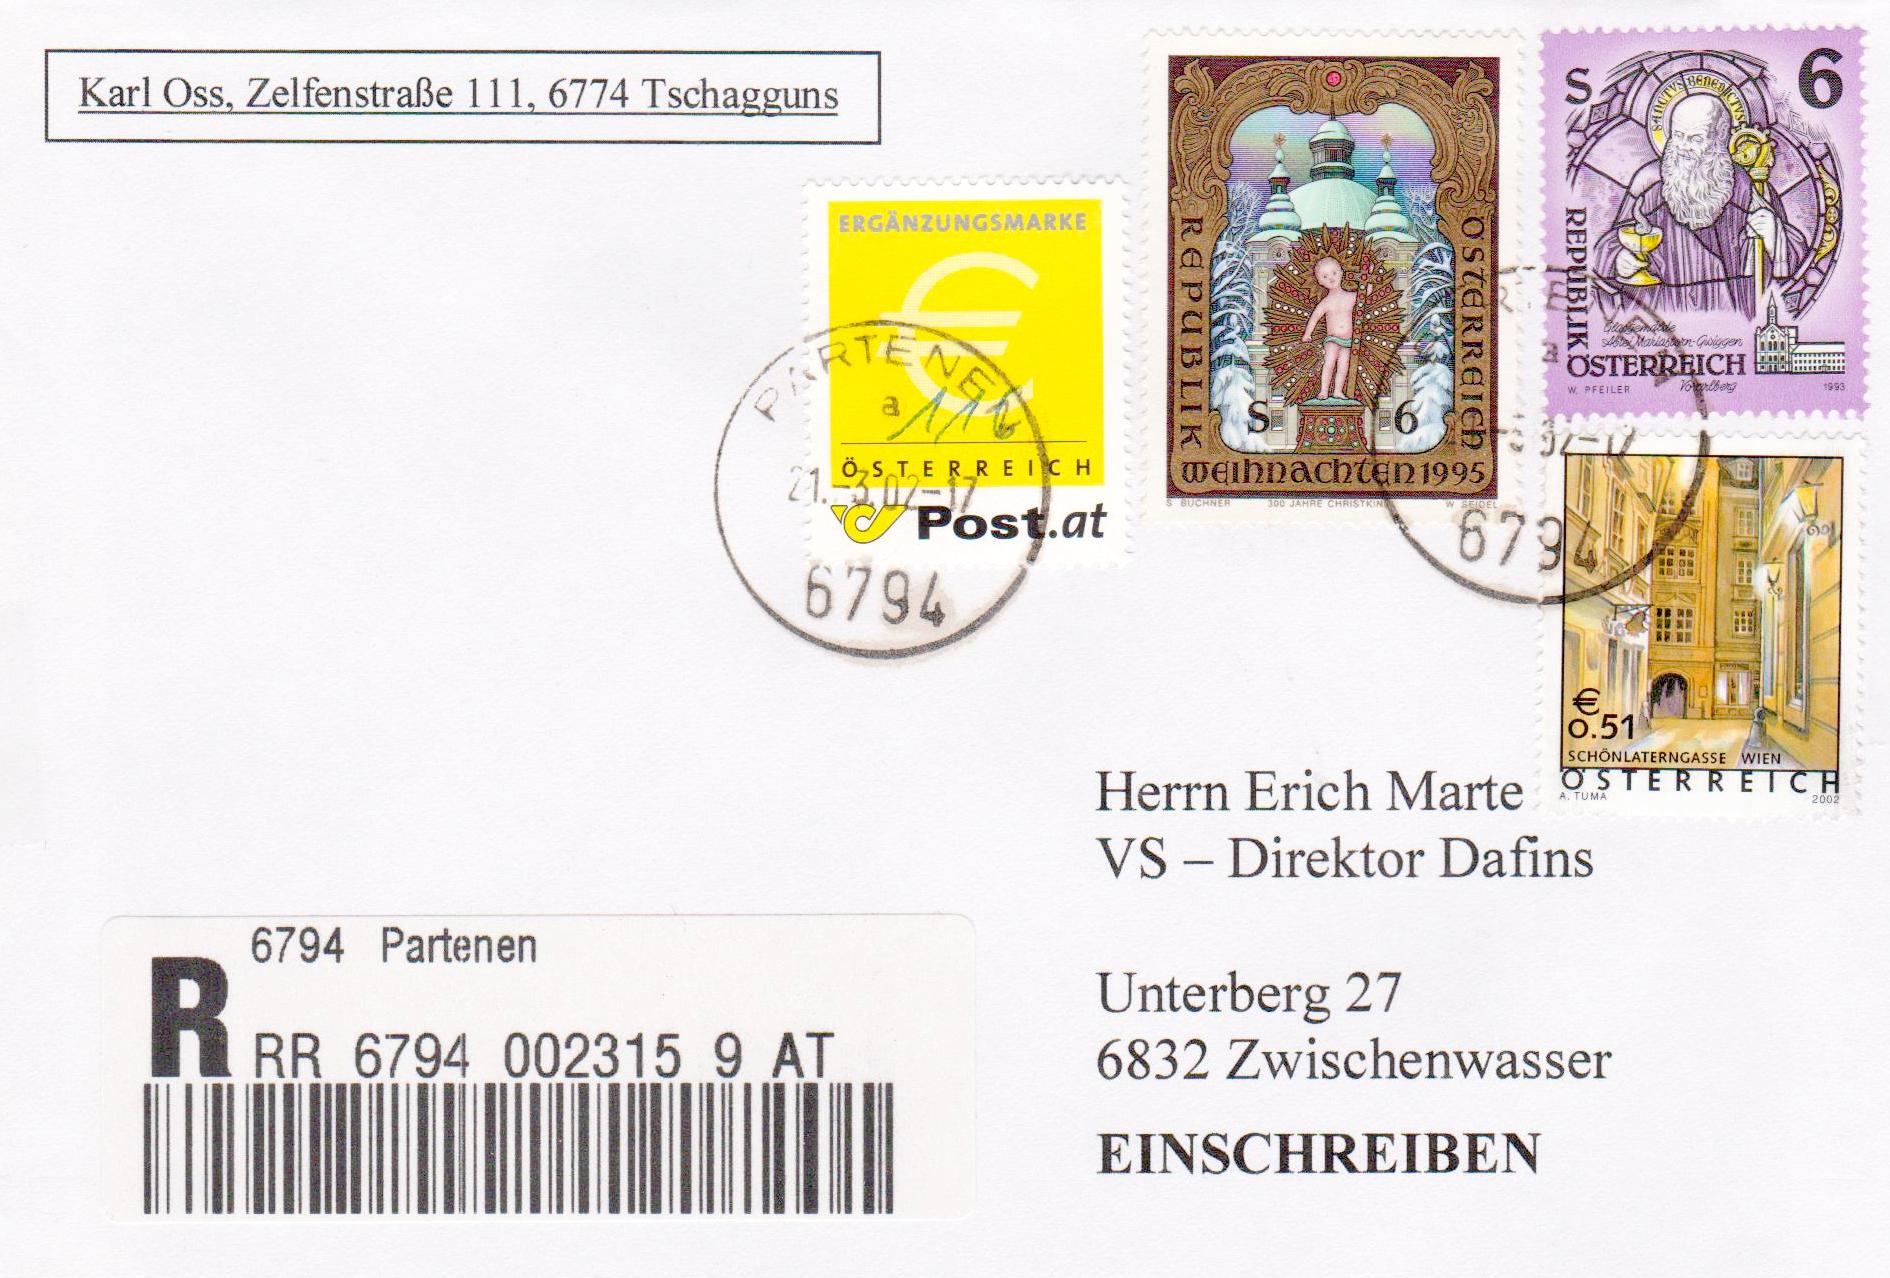 Beleg des Monats April 2018 - 3: RECO-Brief mit Mischfrankatur Schilling /Euro